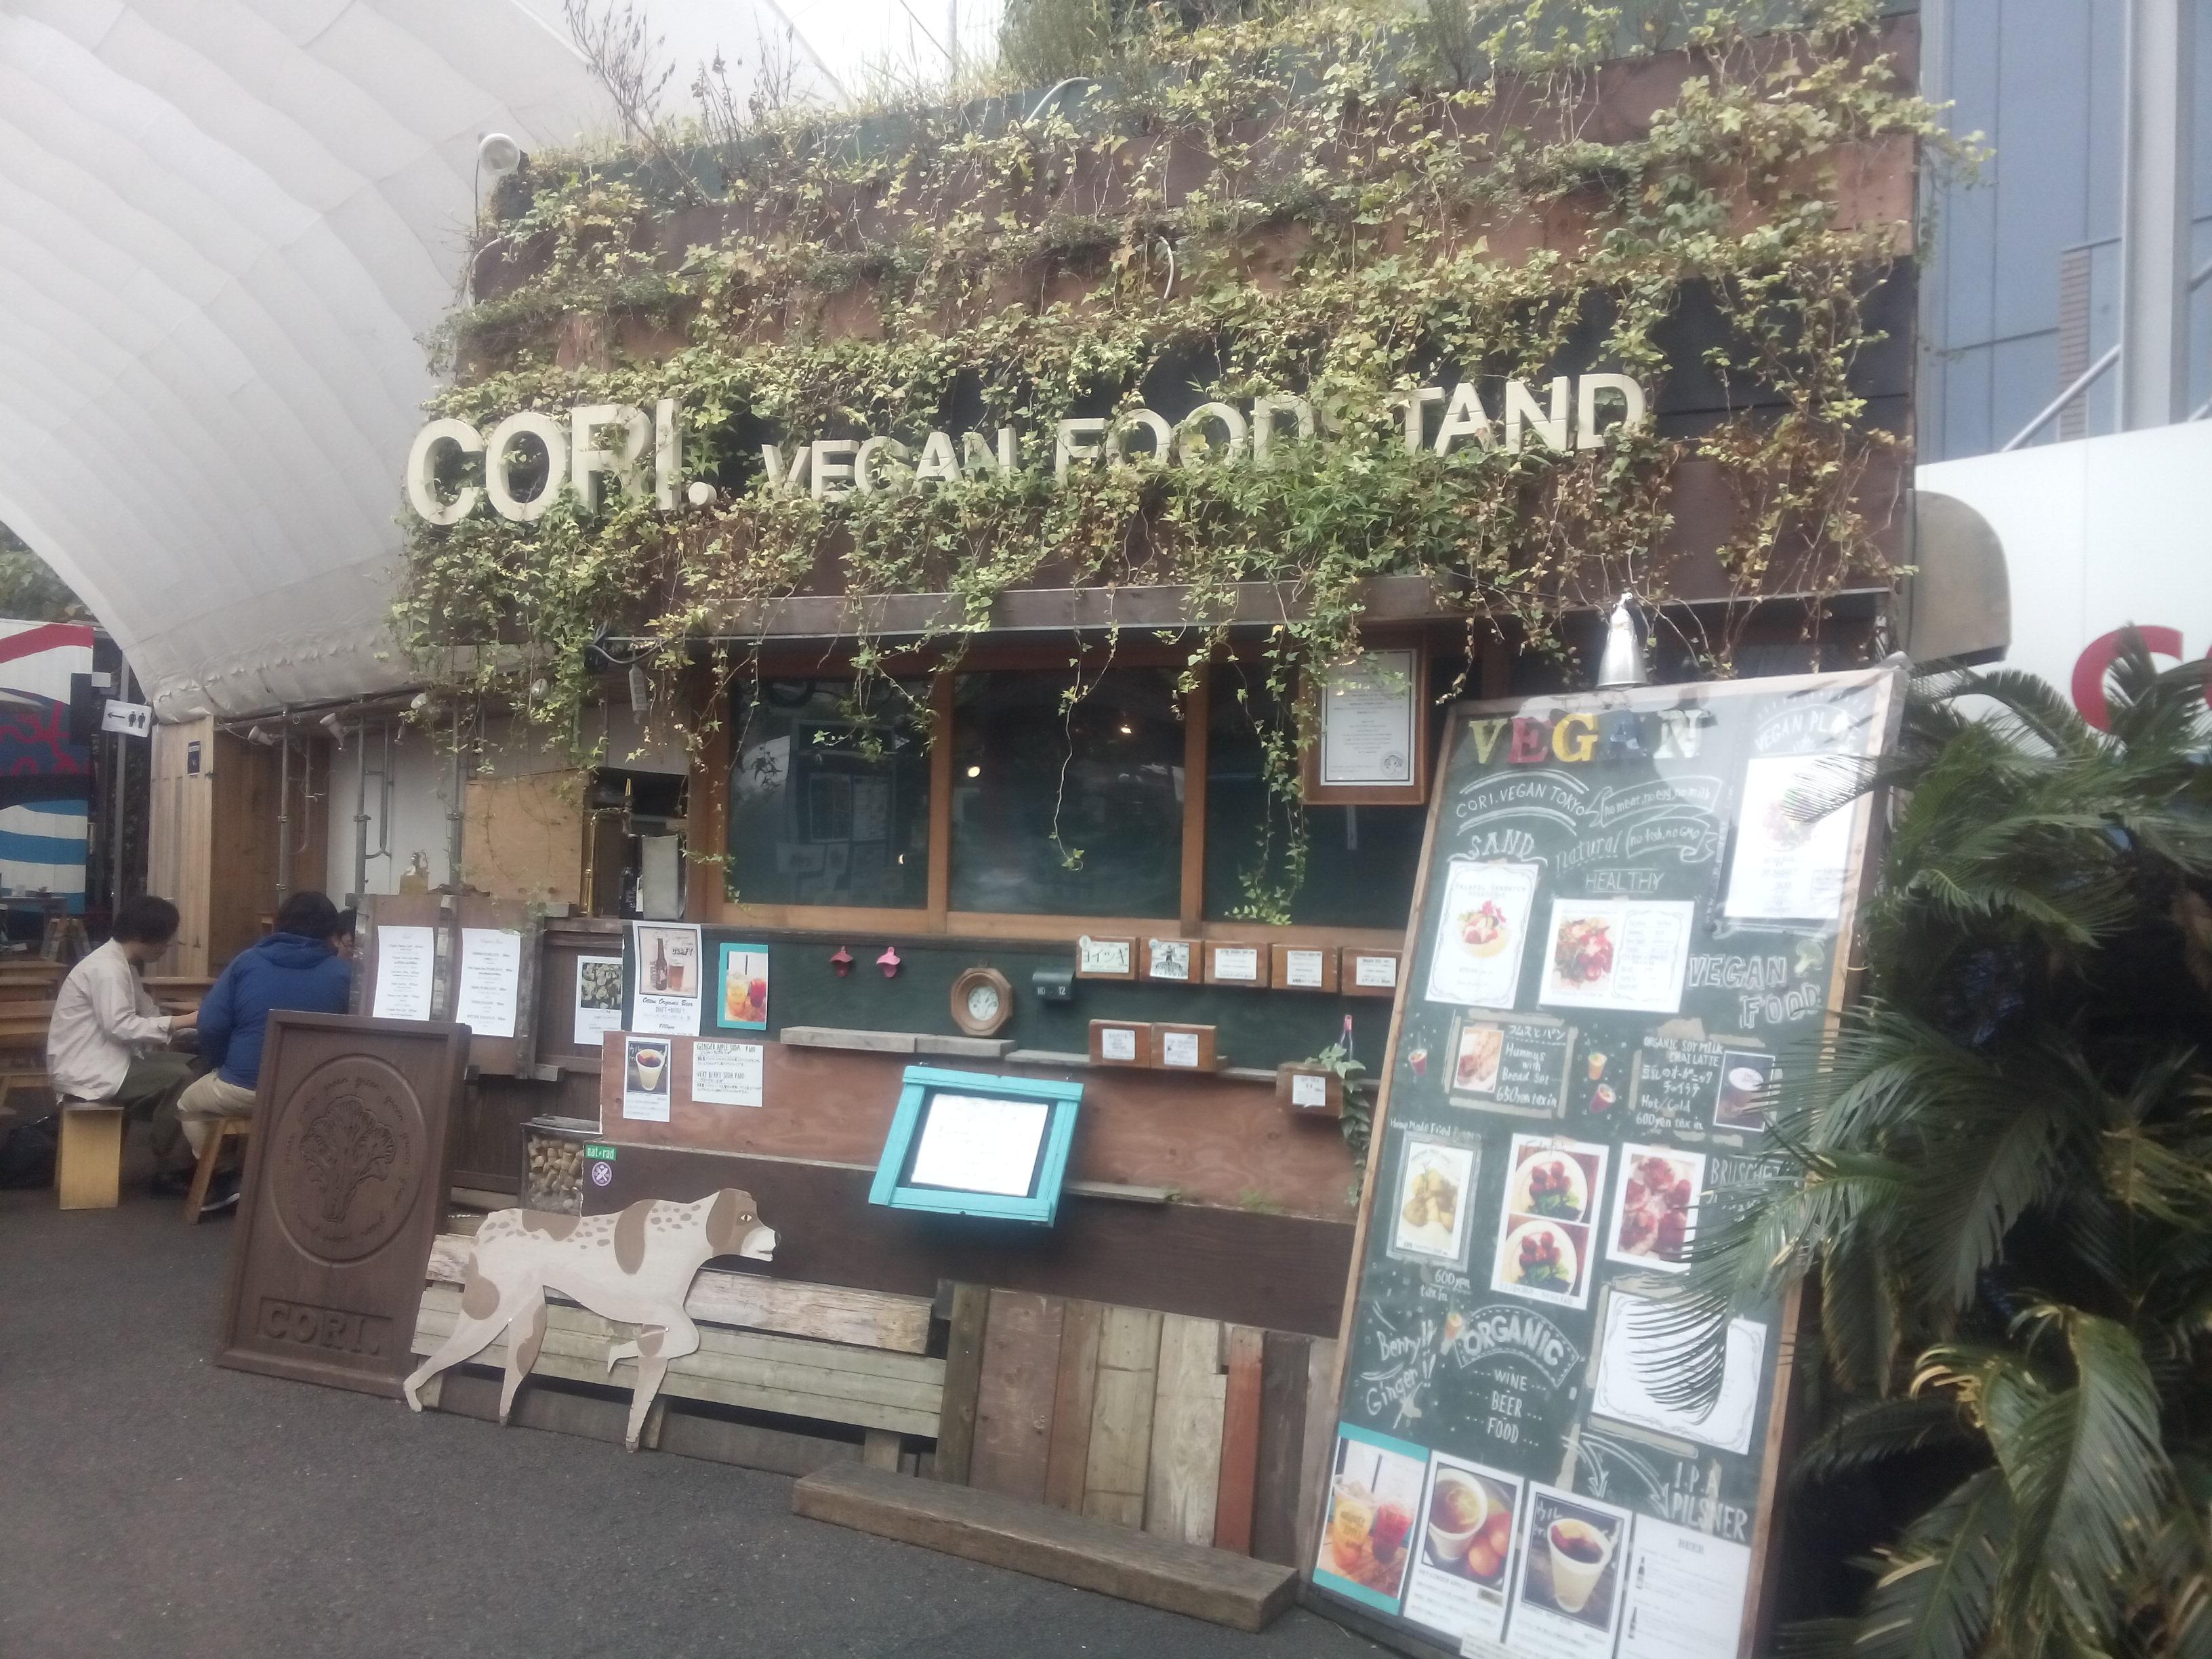 Cori vegan food stand